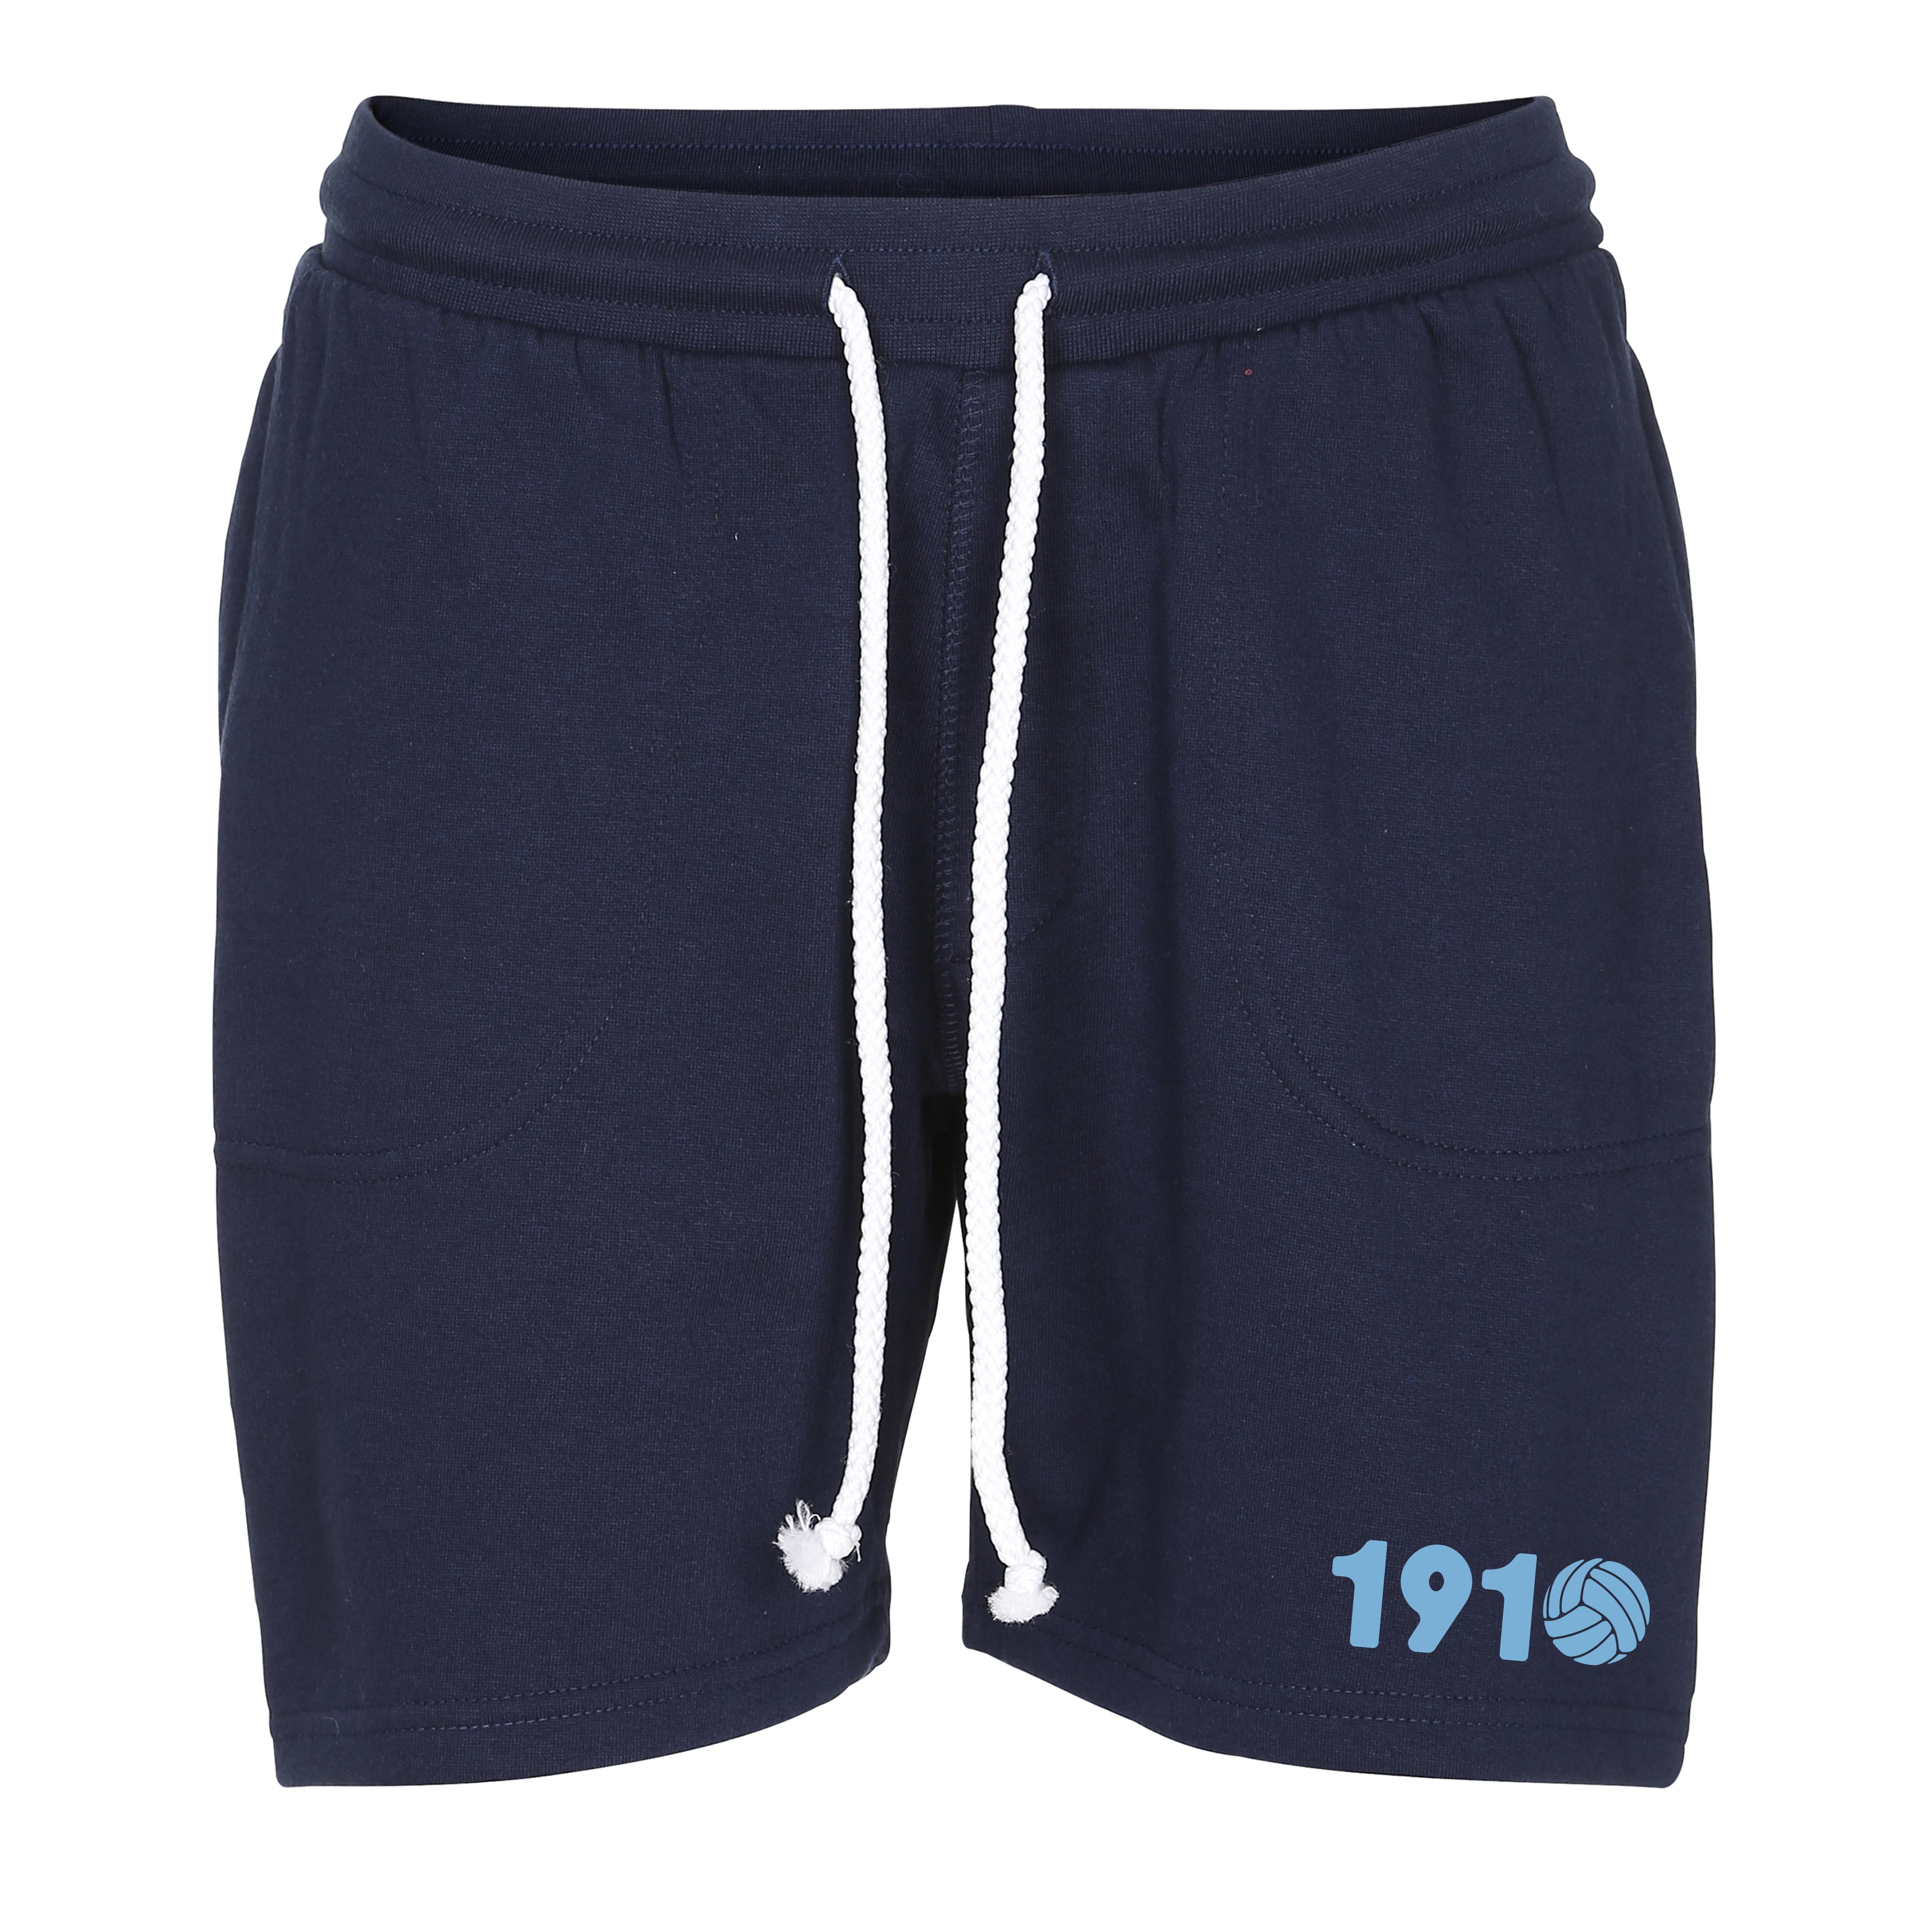 Gripen 1910 - Shorts Unisex